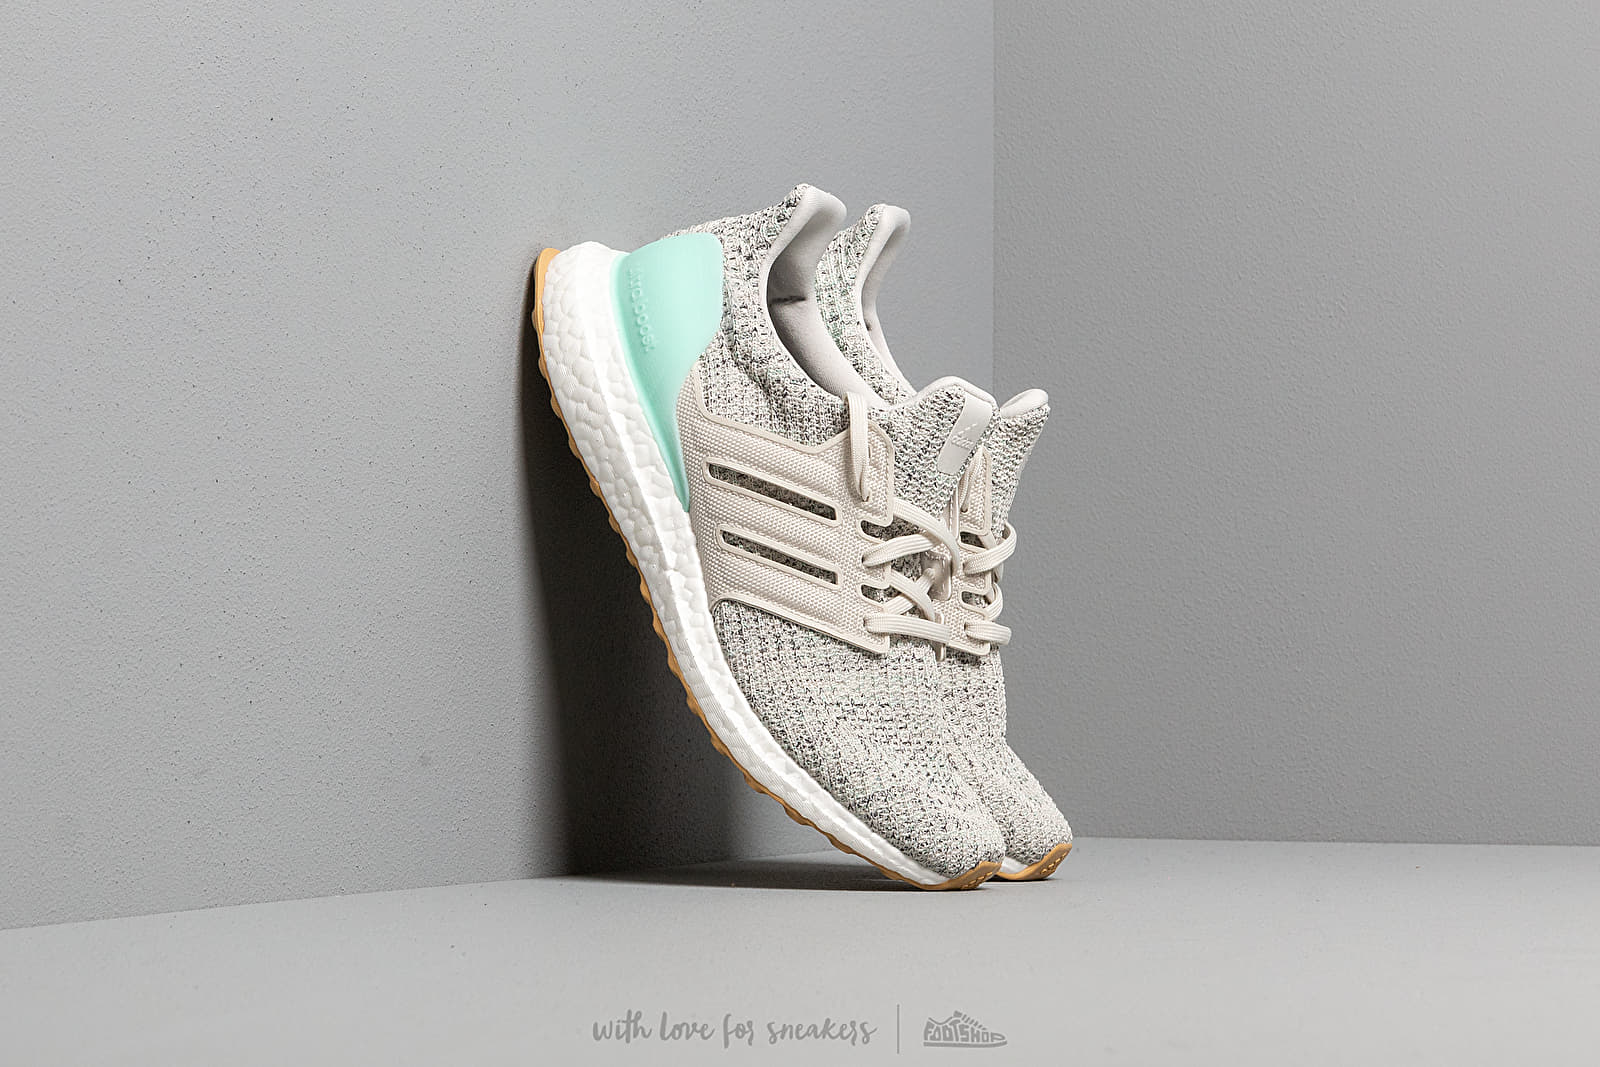 Dámské tenisky a boty adidas UltraBOOST W Clear Mint/ Raw White/ Carbon